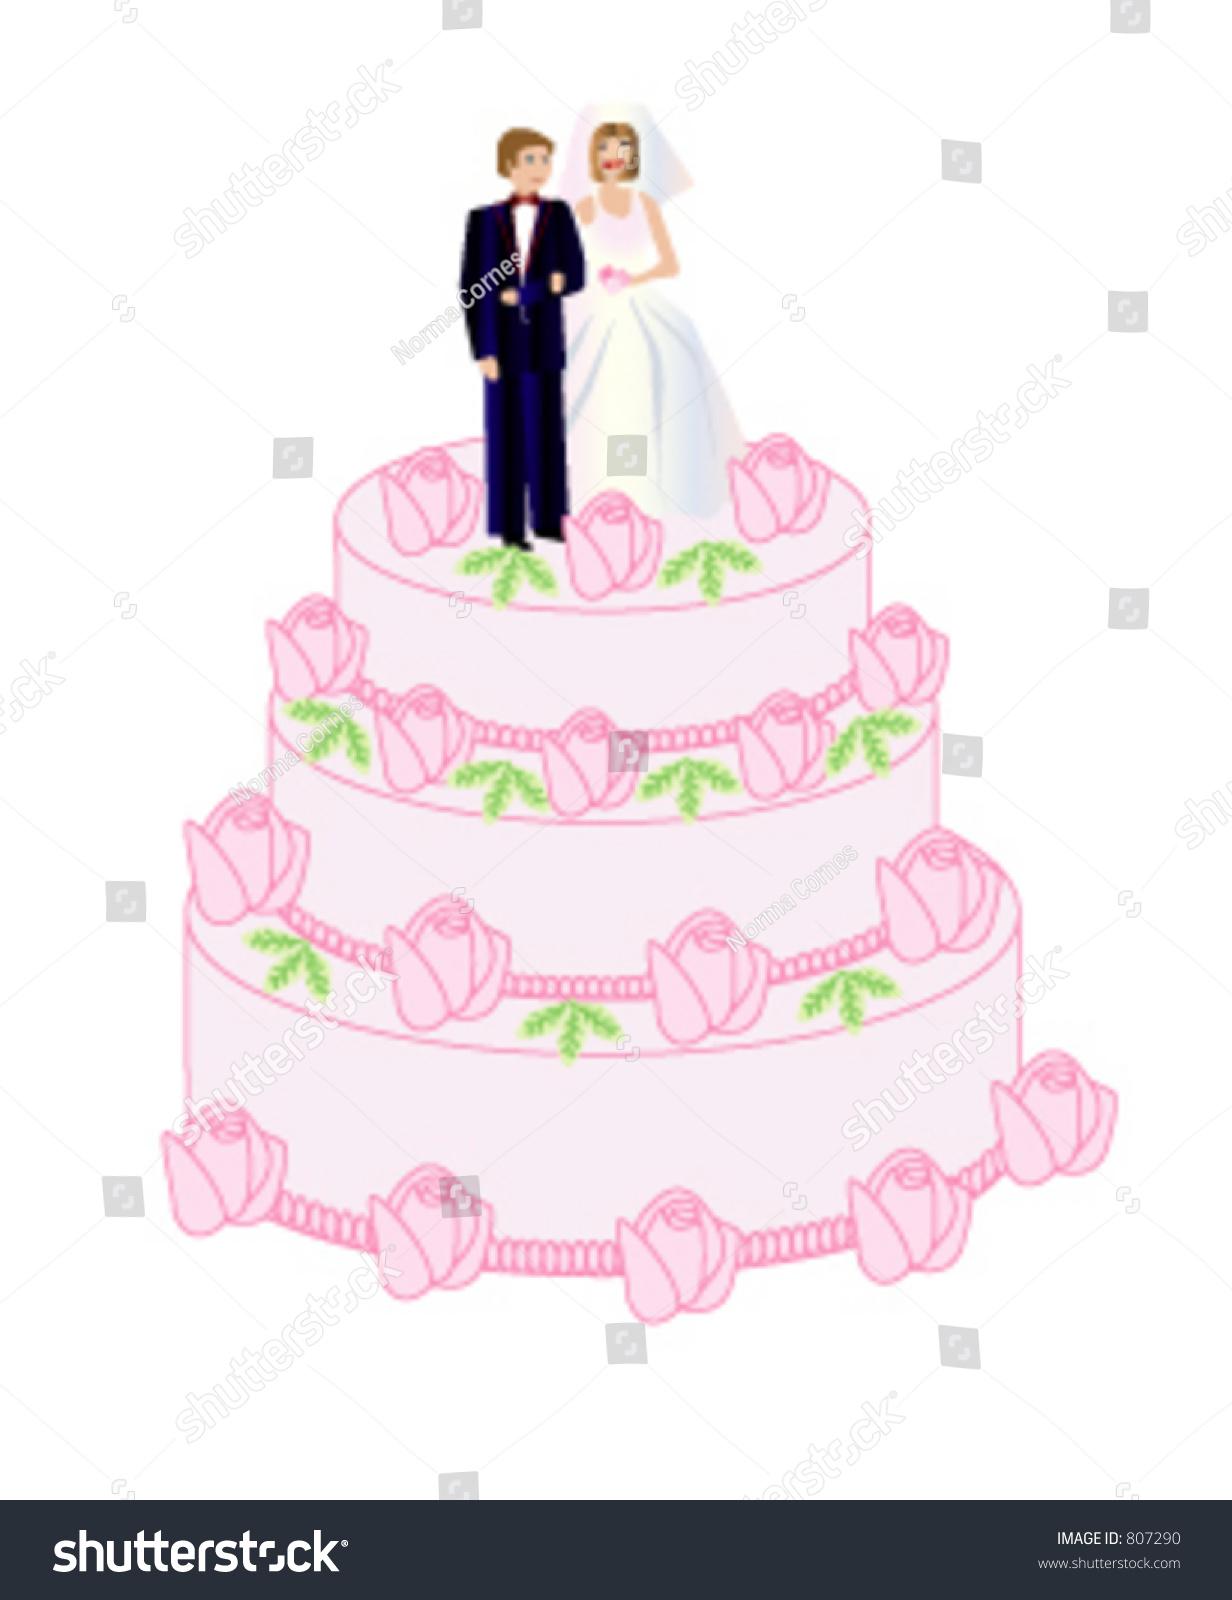 Bride Groom Standing On Wedding Cake Stock Vector (Royalty Free ...